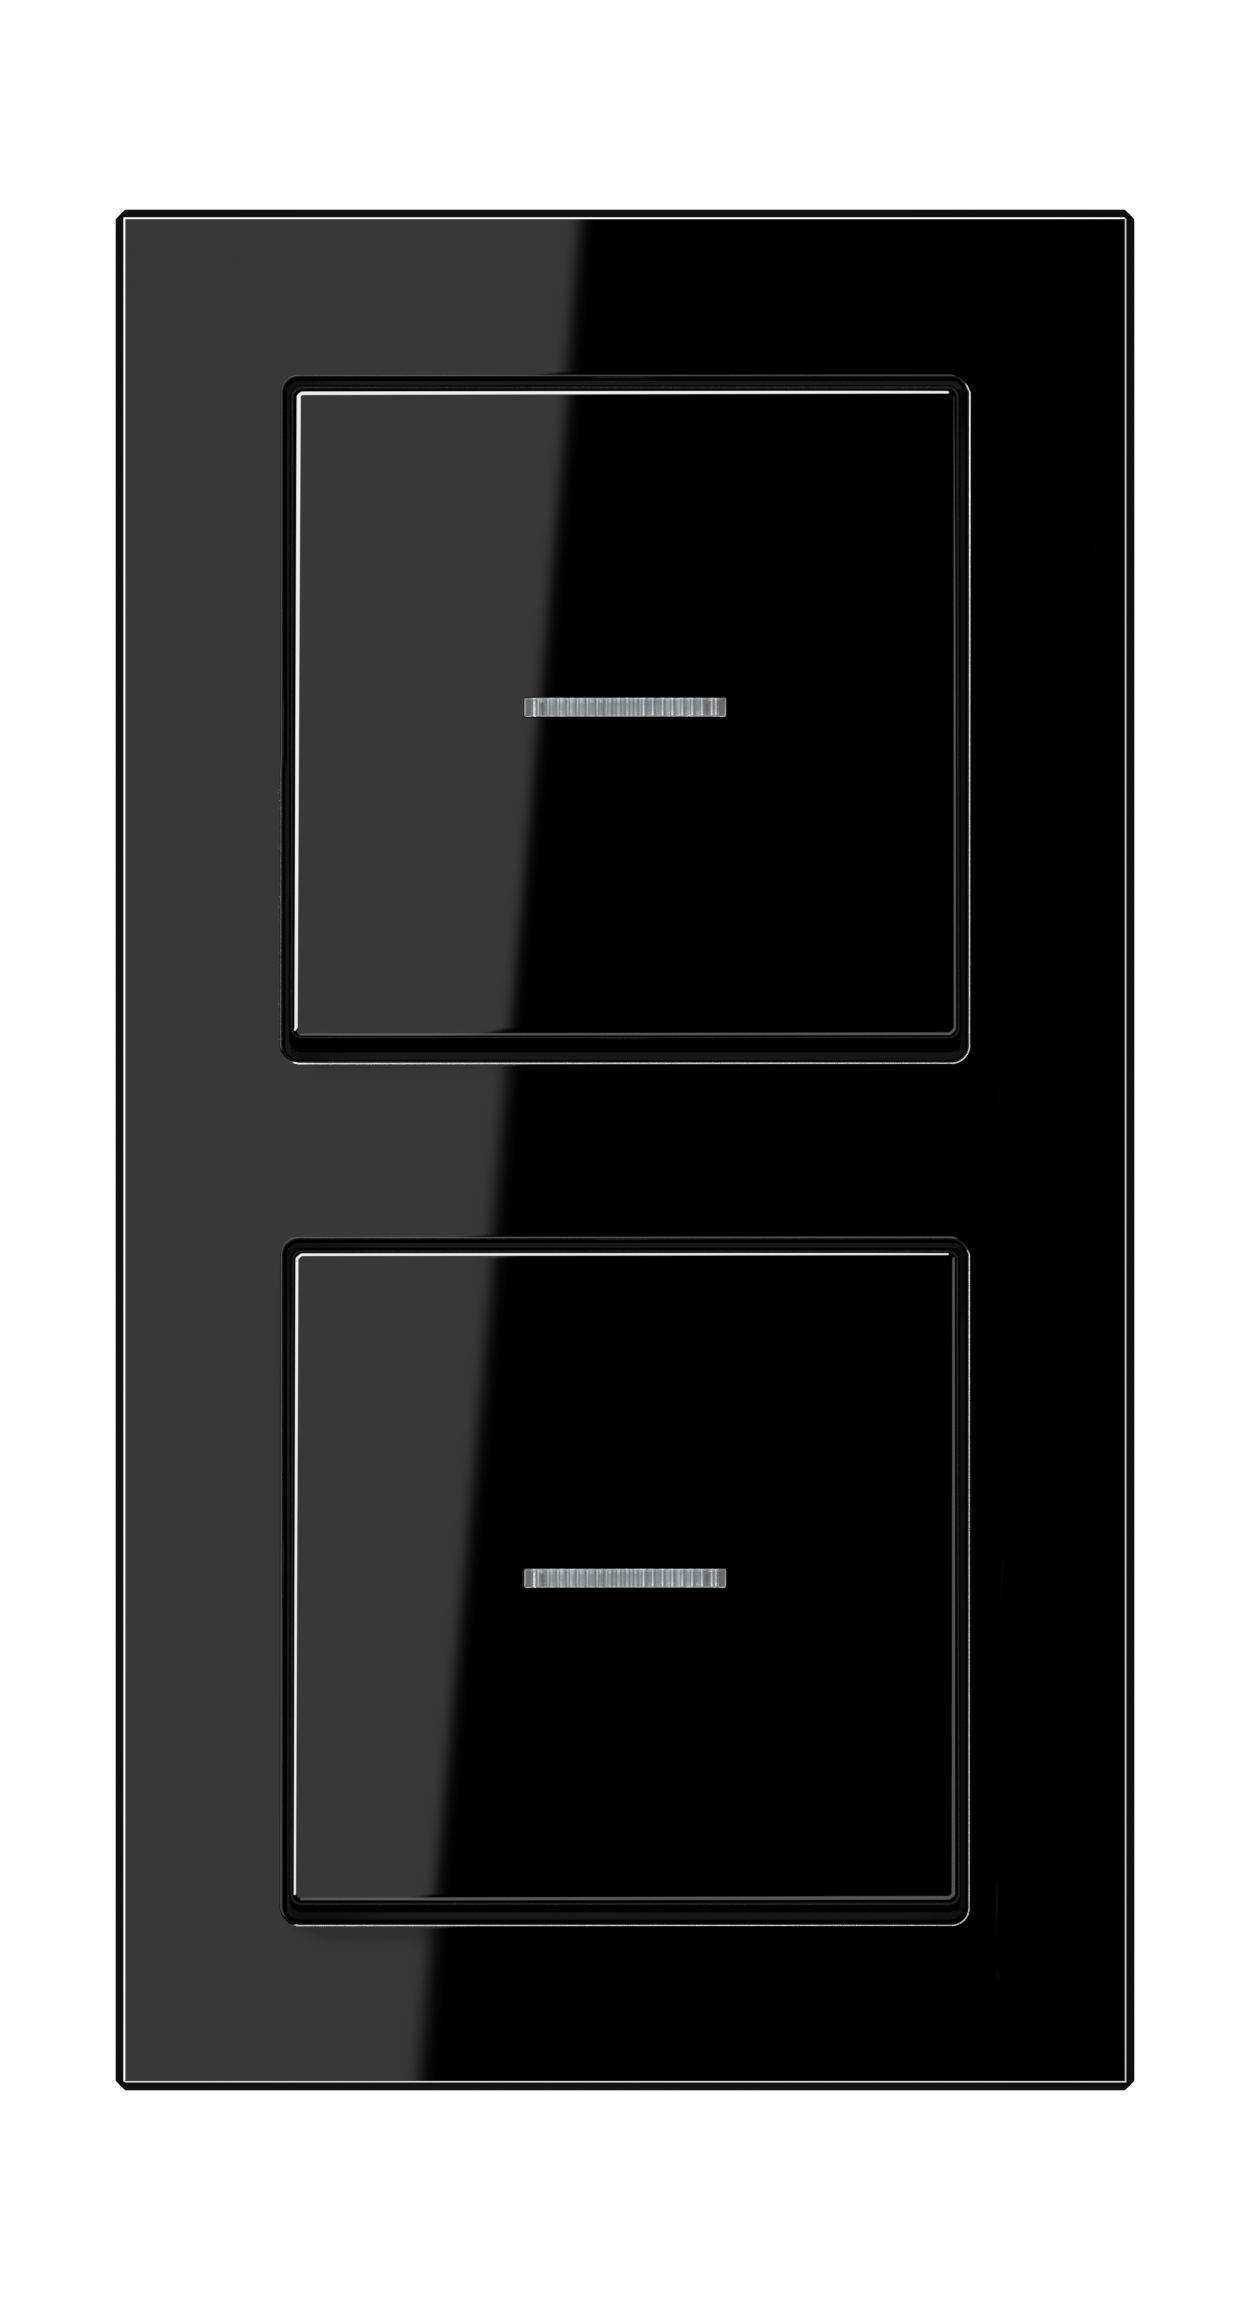 JUNG_AC_black_switch-lense_switch-lense